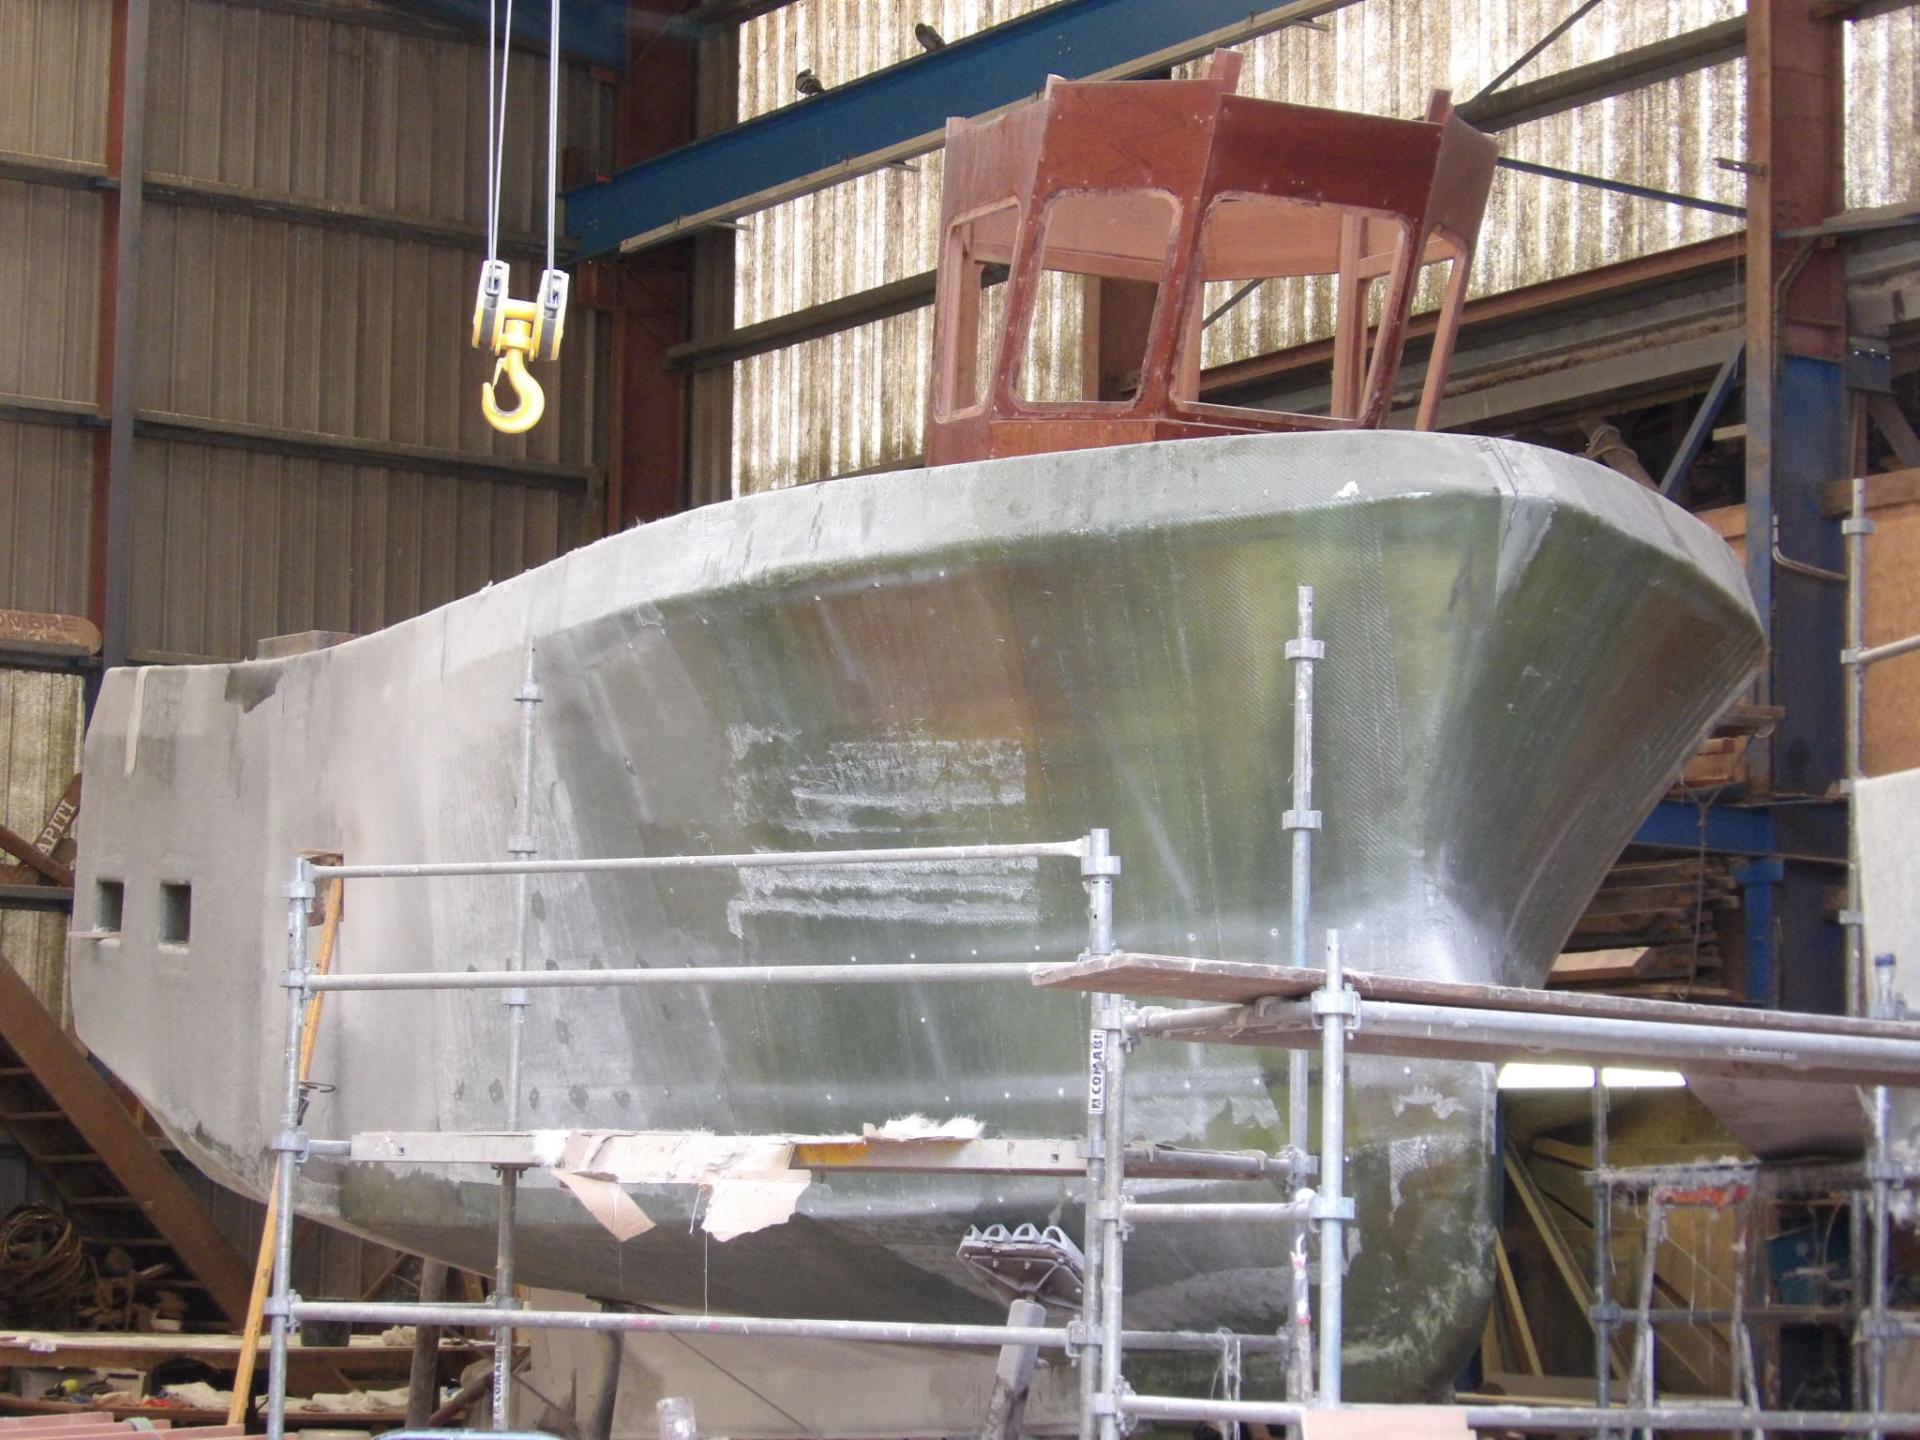 210511 chantier tanguy navire en construction